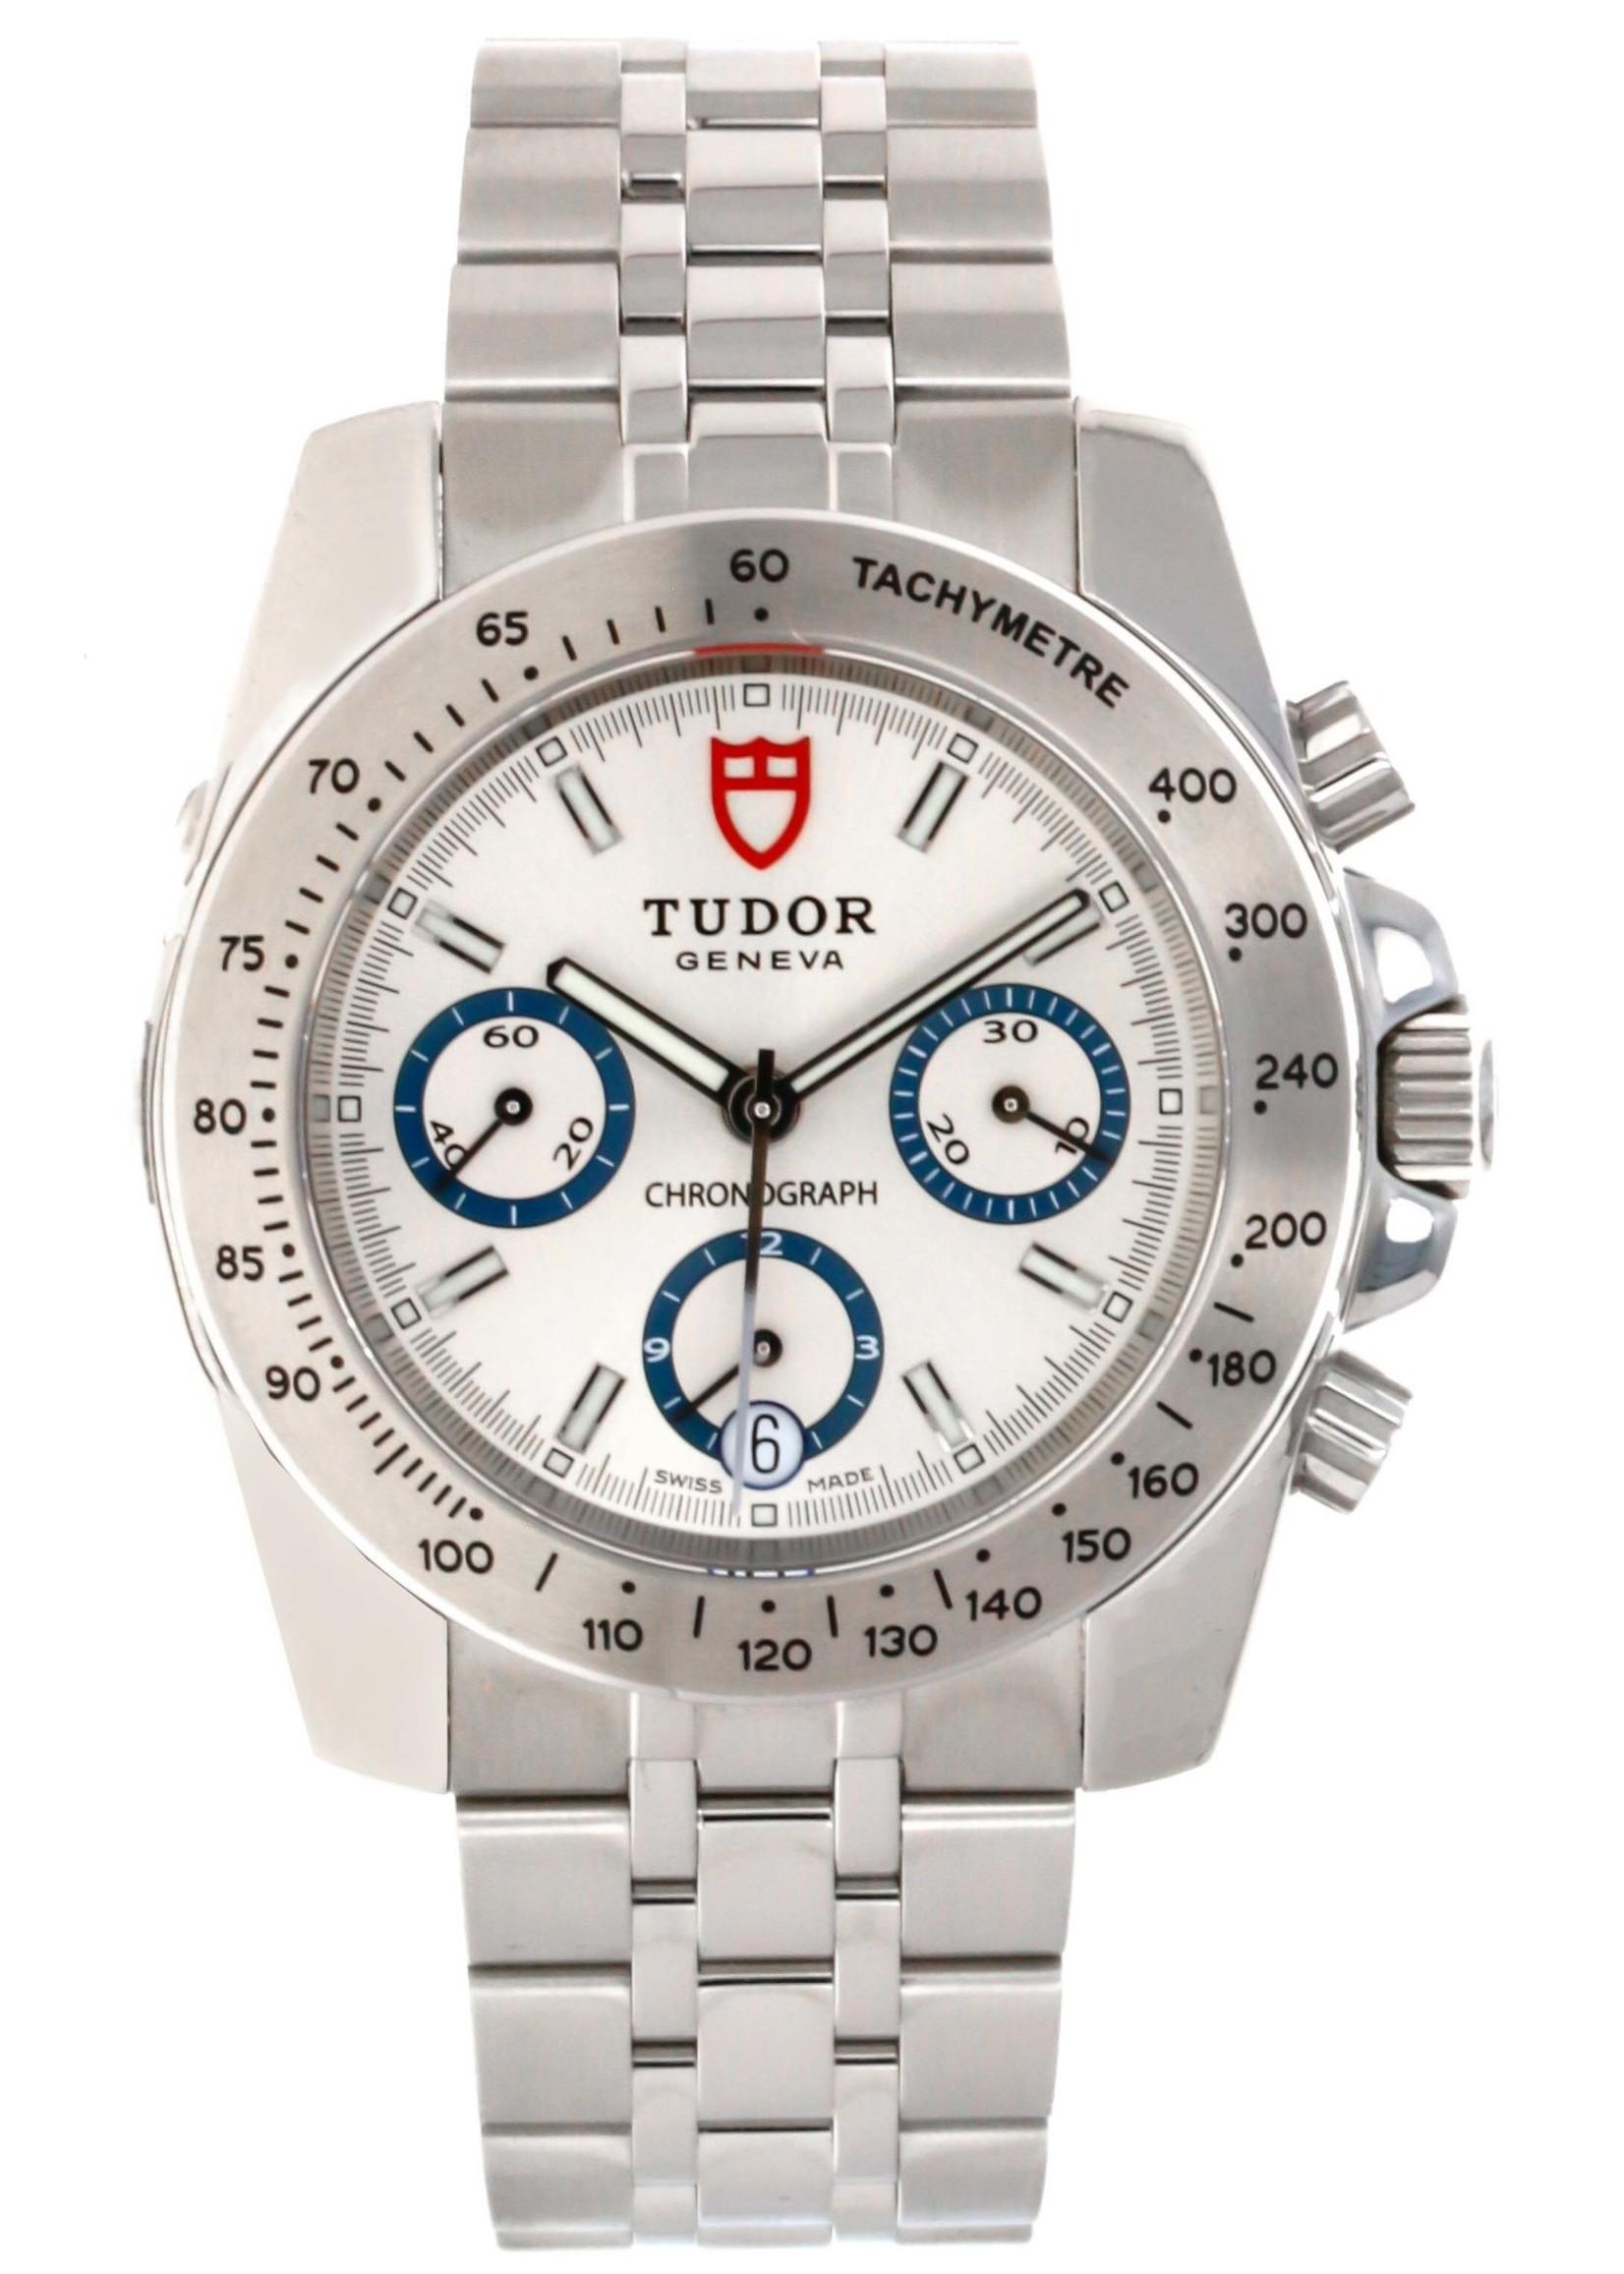 Tudor TUDOR CHRONOGRAPH (NEW)